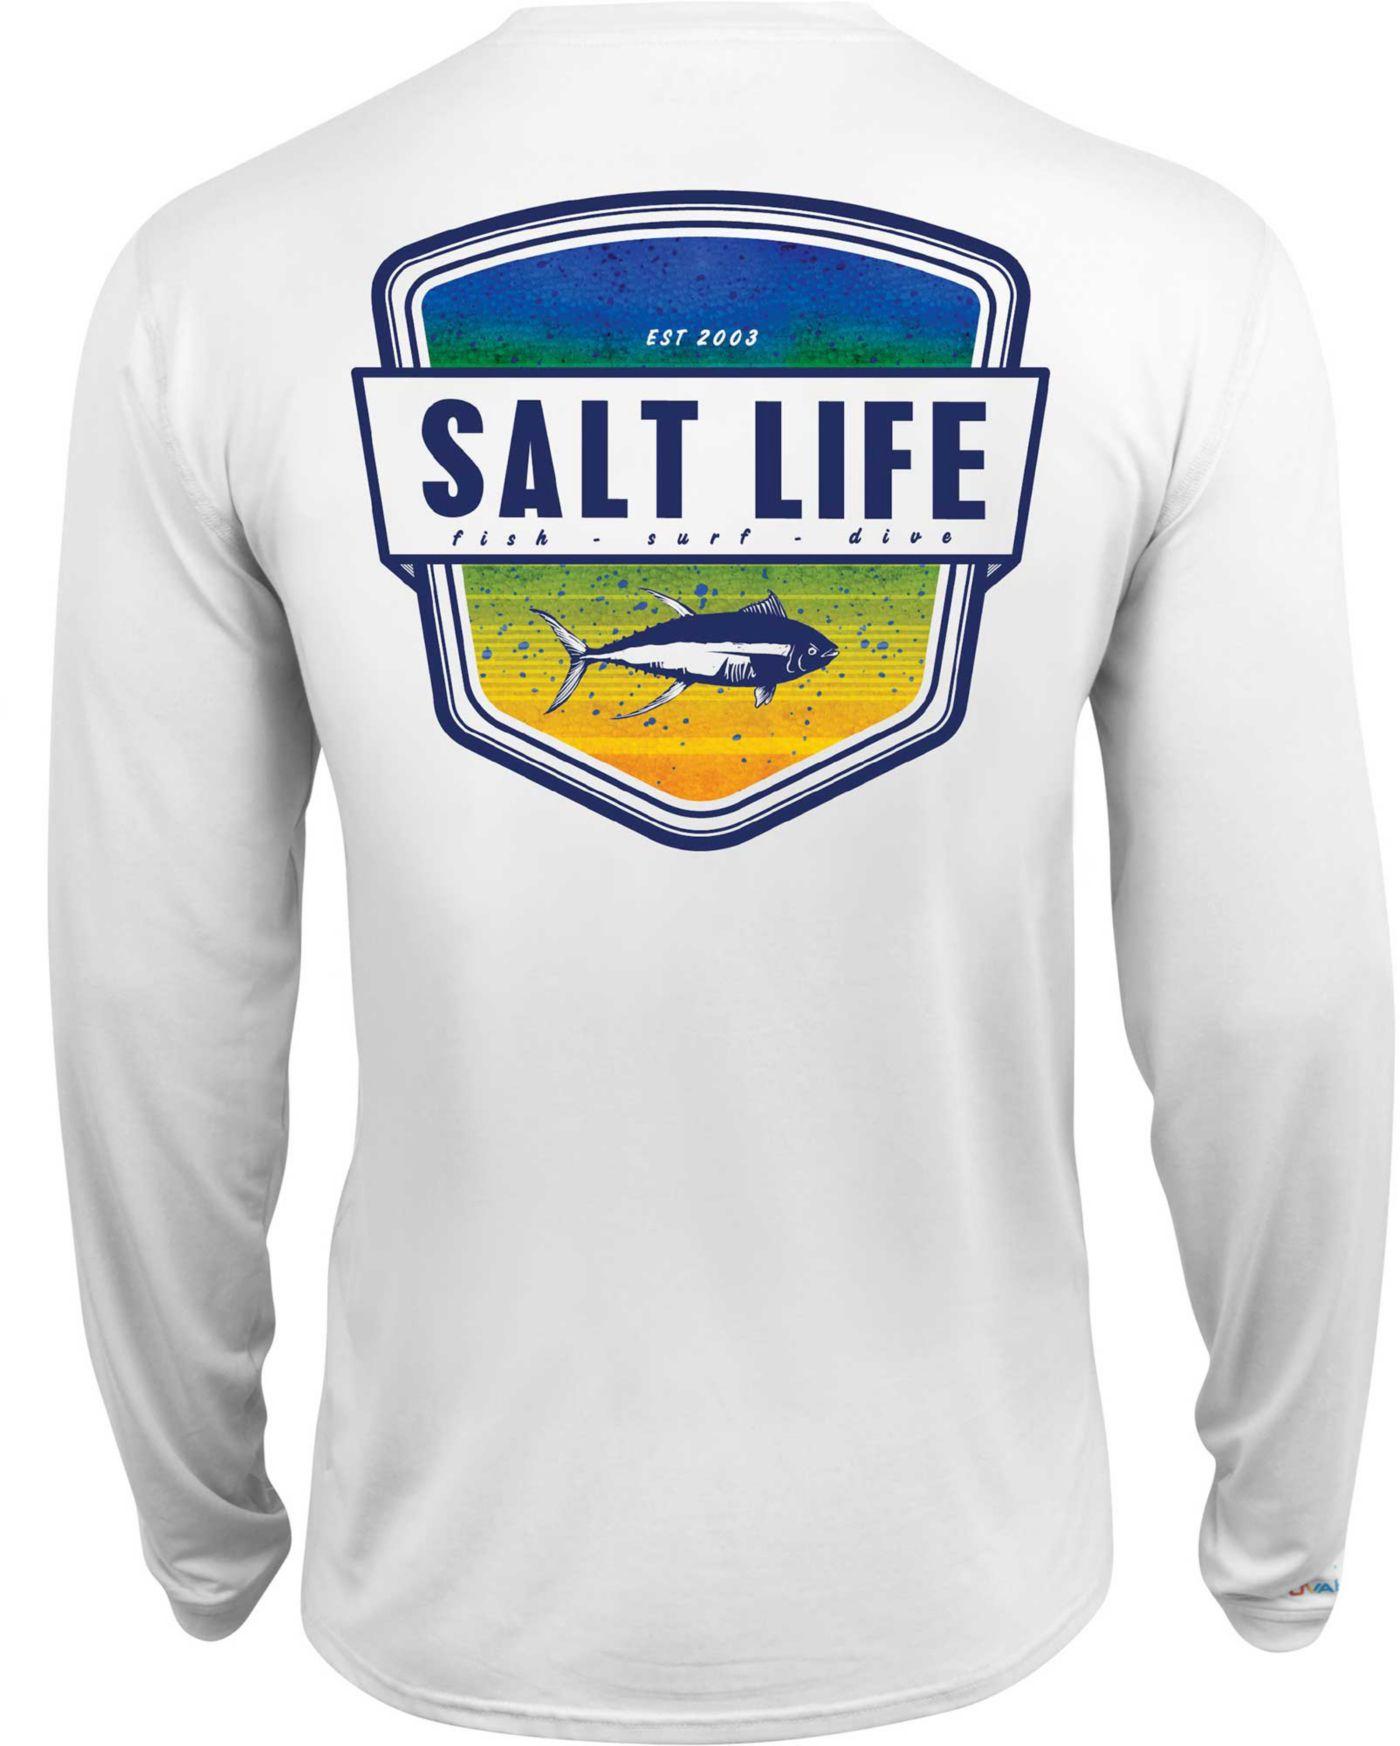 Salt Life Men's Electric Skinz Badge Long Sleeve Performance Shirt